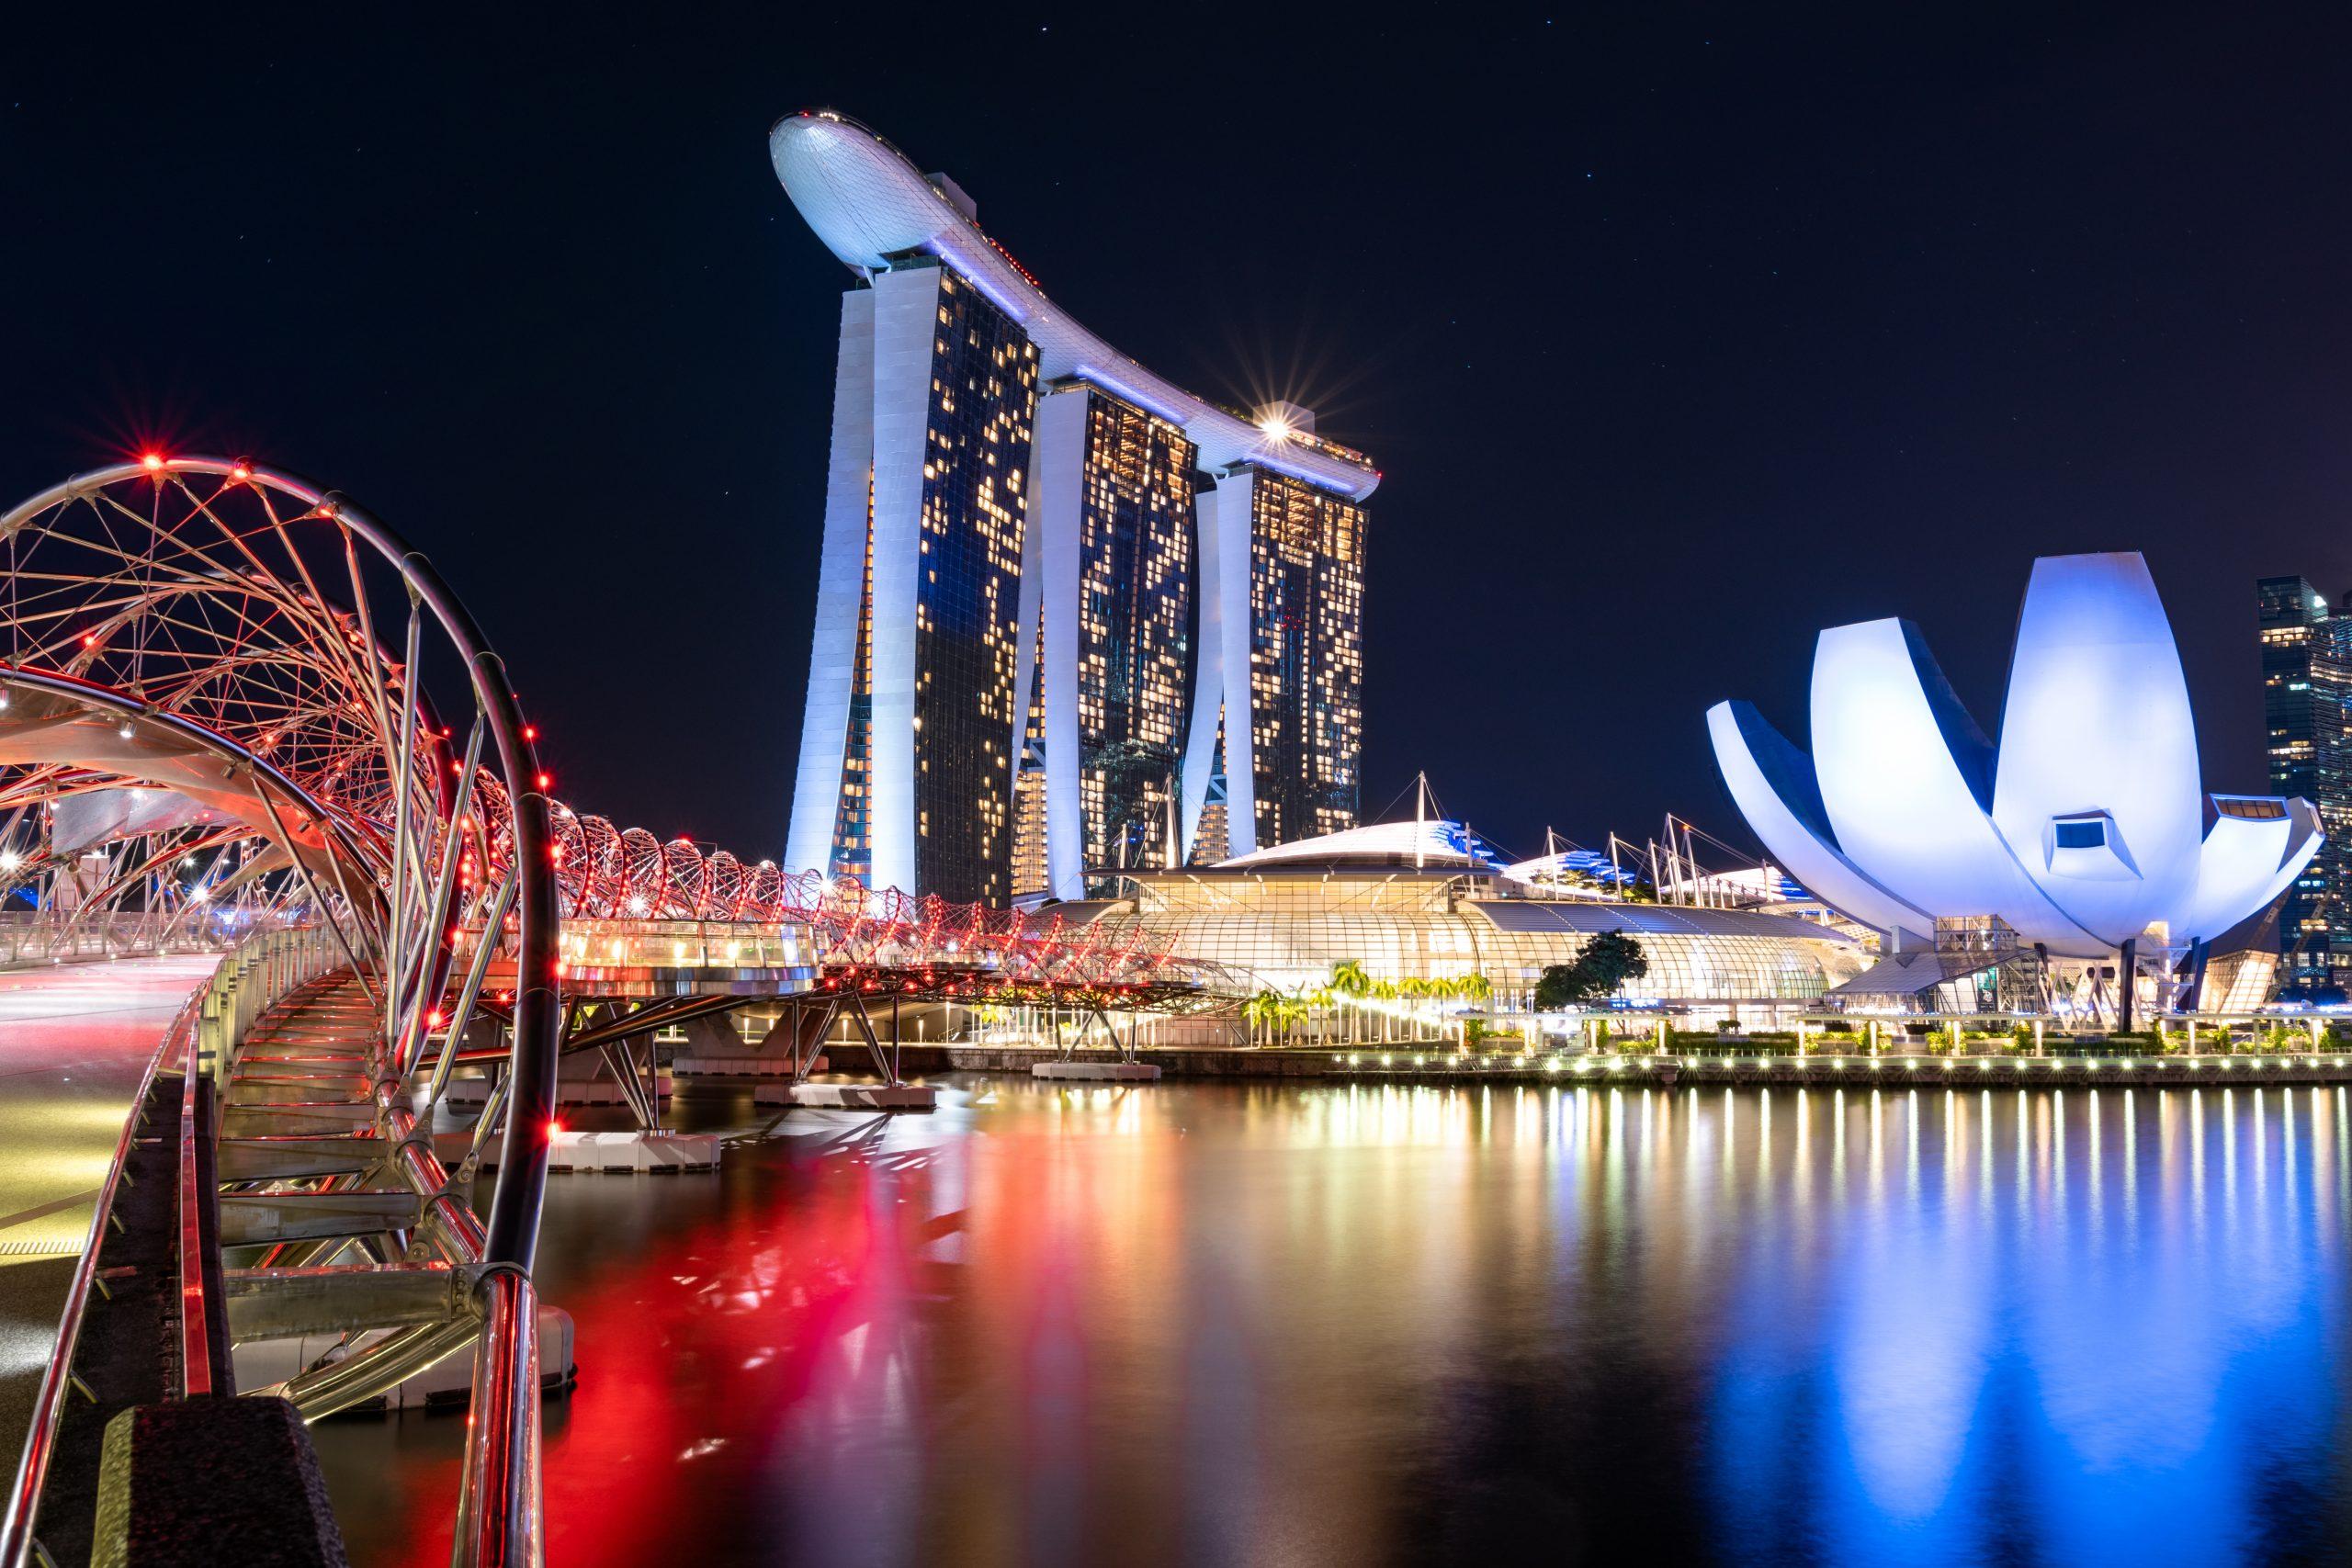 Singapur Nachtaufnahme